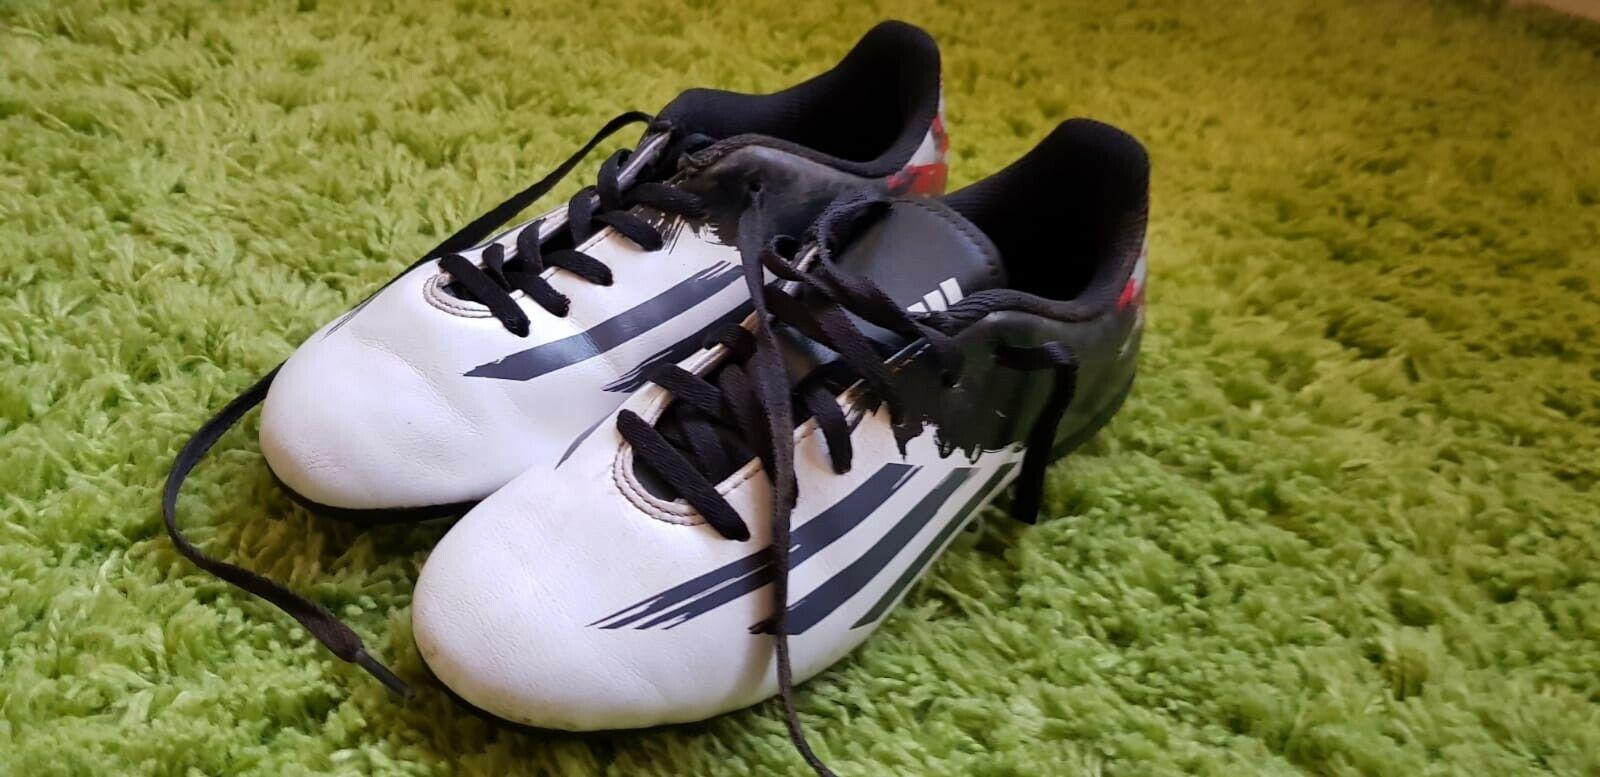 Adidas football boots studs size 4